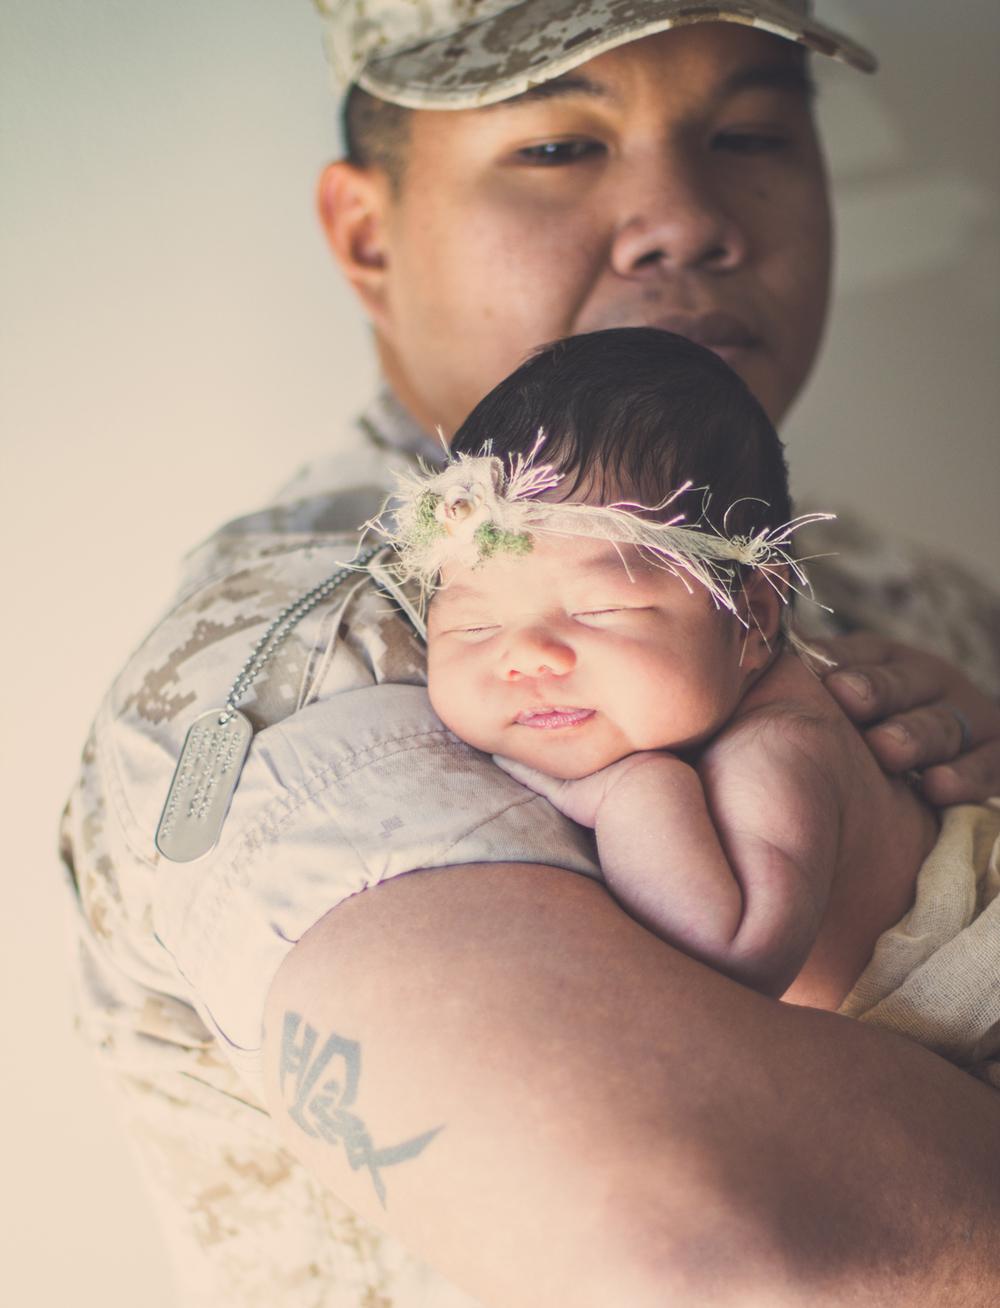 Rochester NY Lifestyle Newborn Photographer Kelly Kester_23.jpg